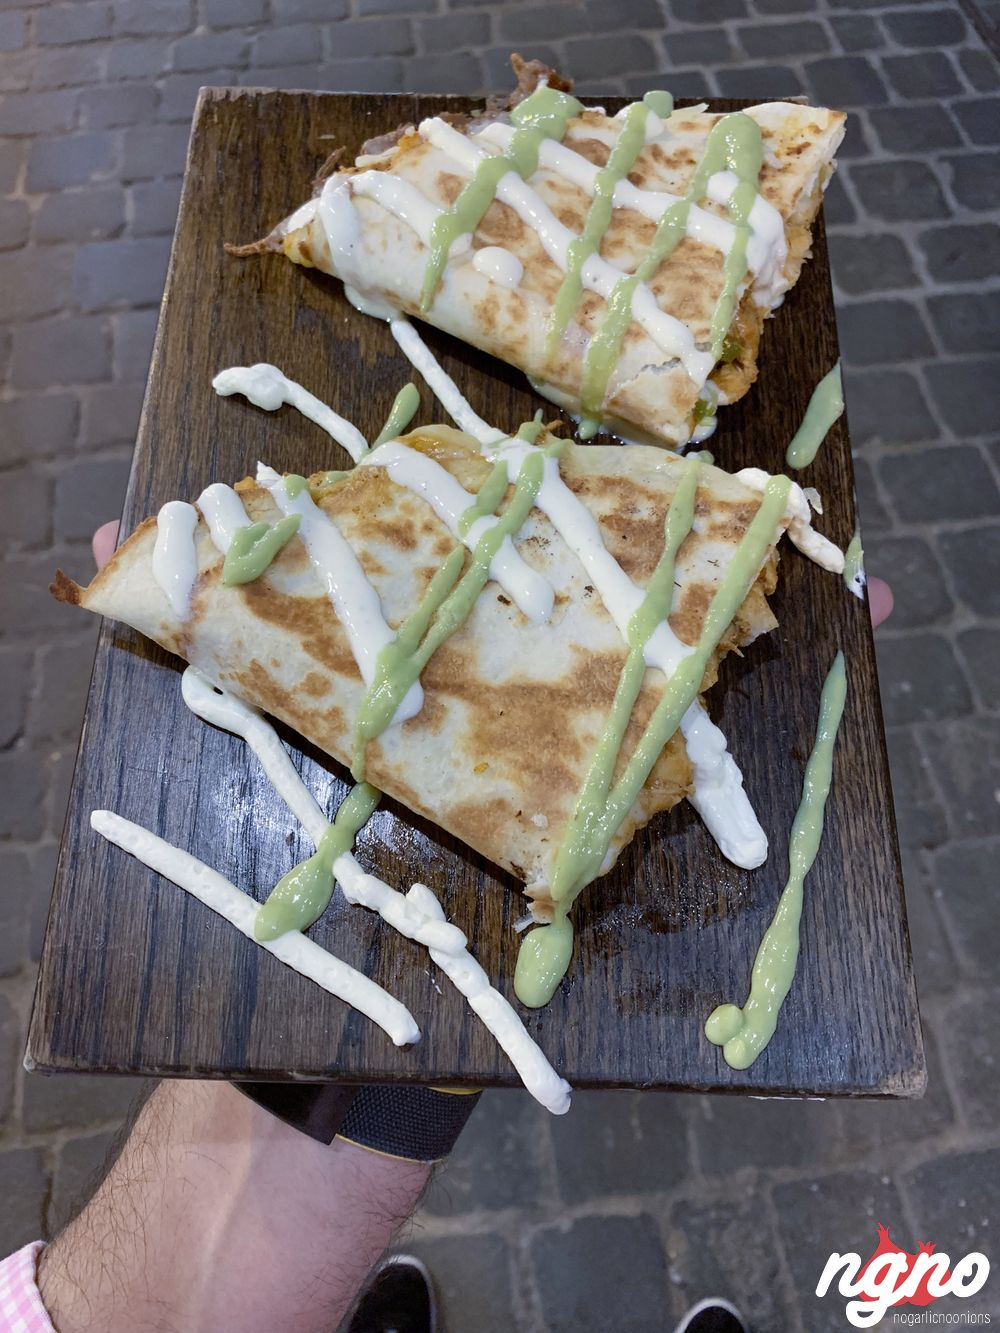 souk-el-akel-thursday-street-food-lebanon-food-nogarlicnoonions-312018-11-18-01-42-06